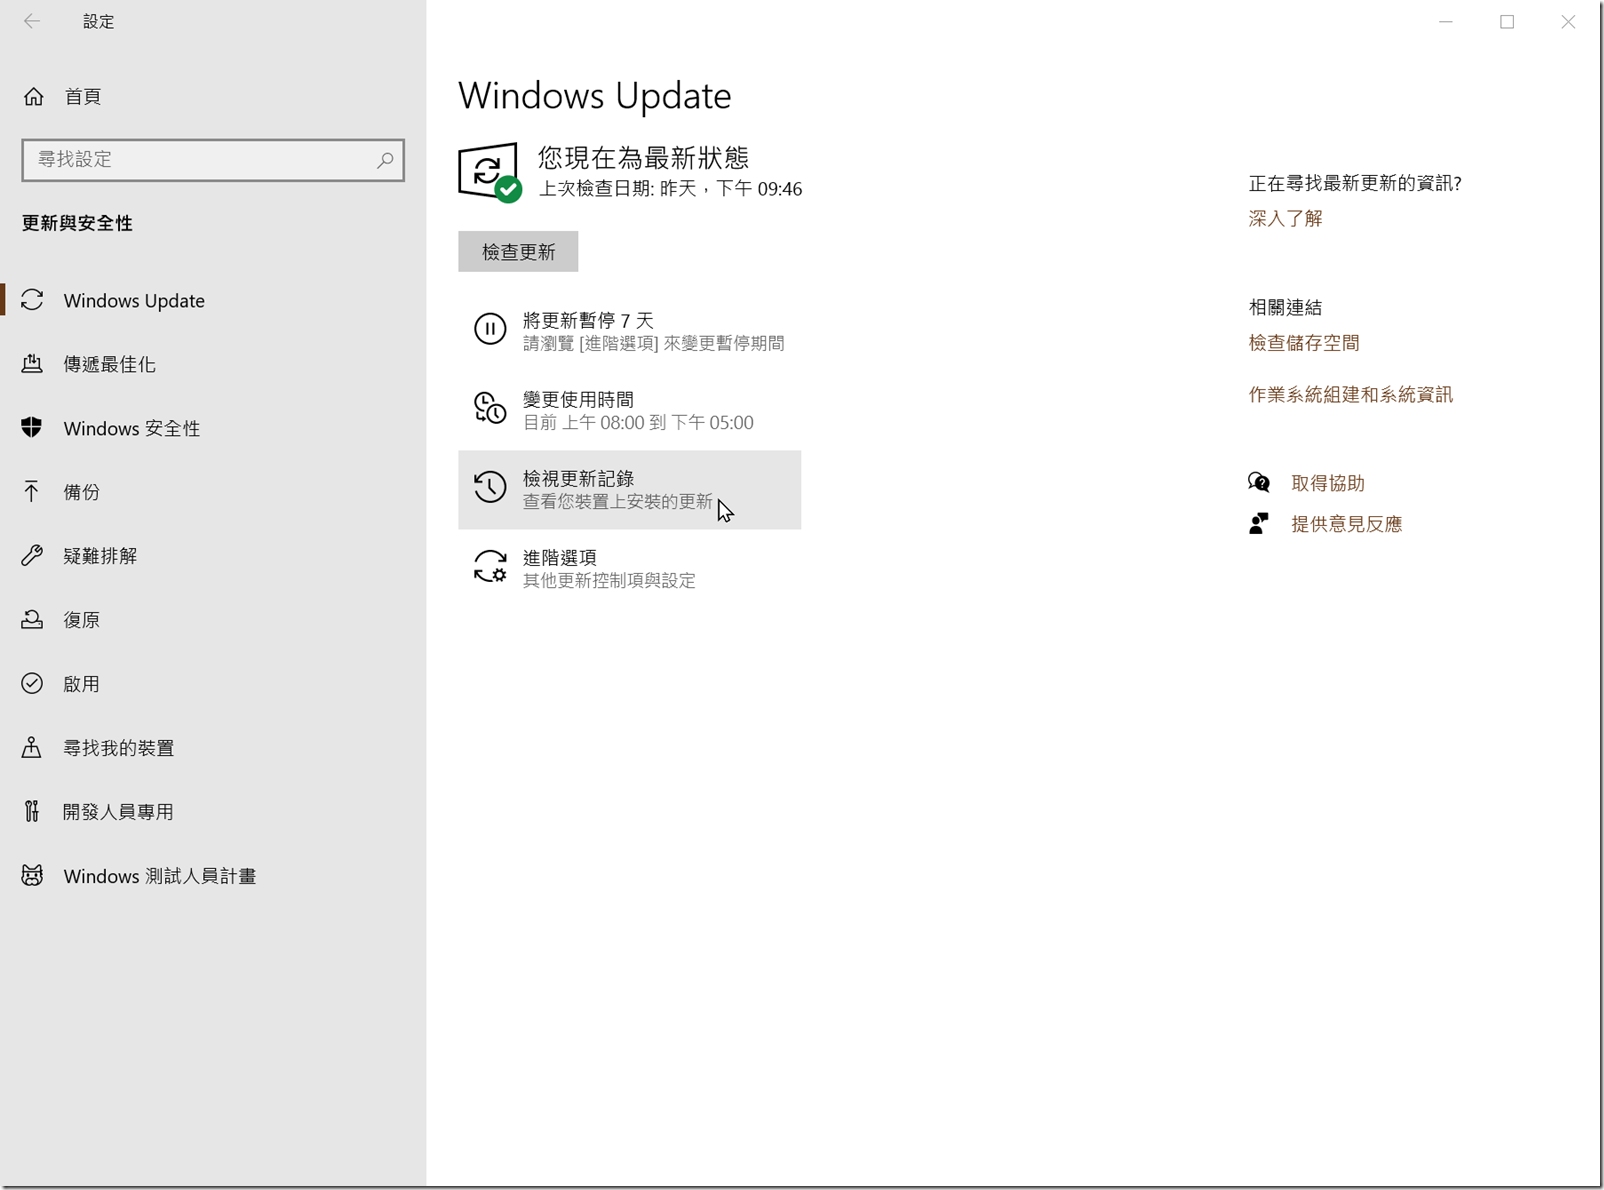 Windows  10 系統狀態列圖示出現顯示異常 (圖示重疊/不顯示/錯誤) 的解決方法 @3C 達人廖阿輝